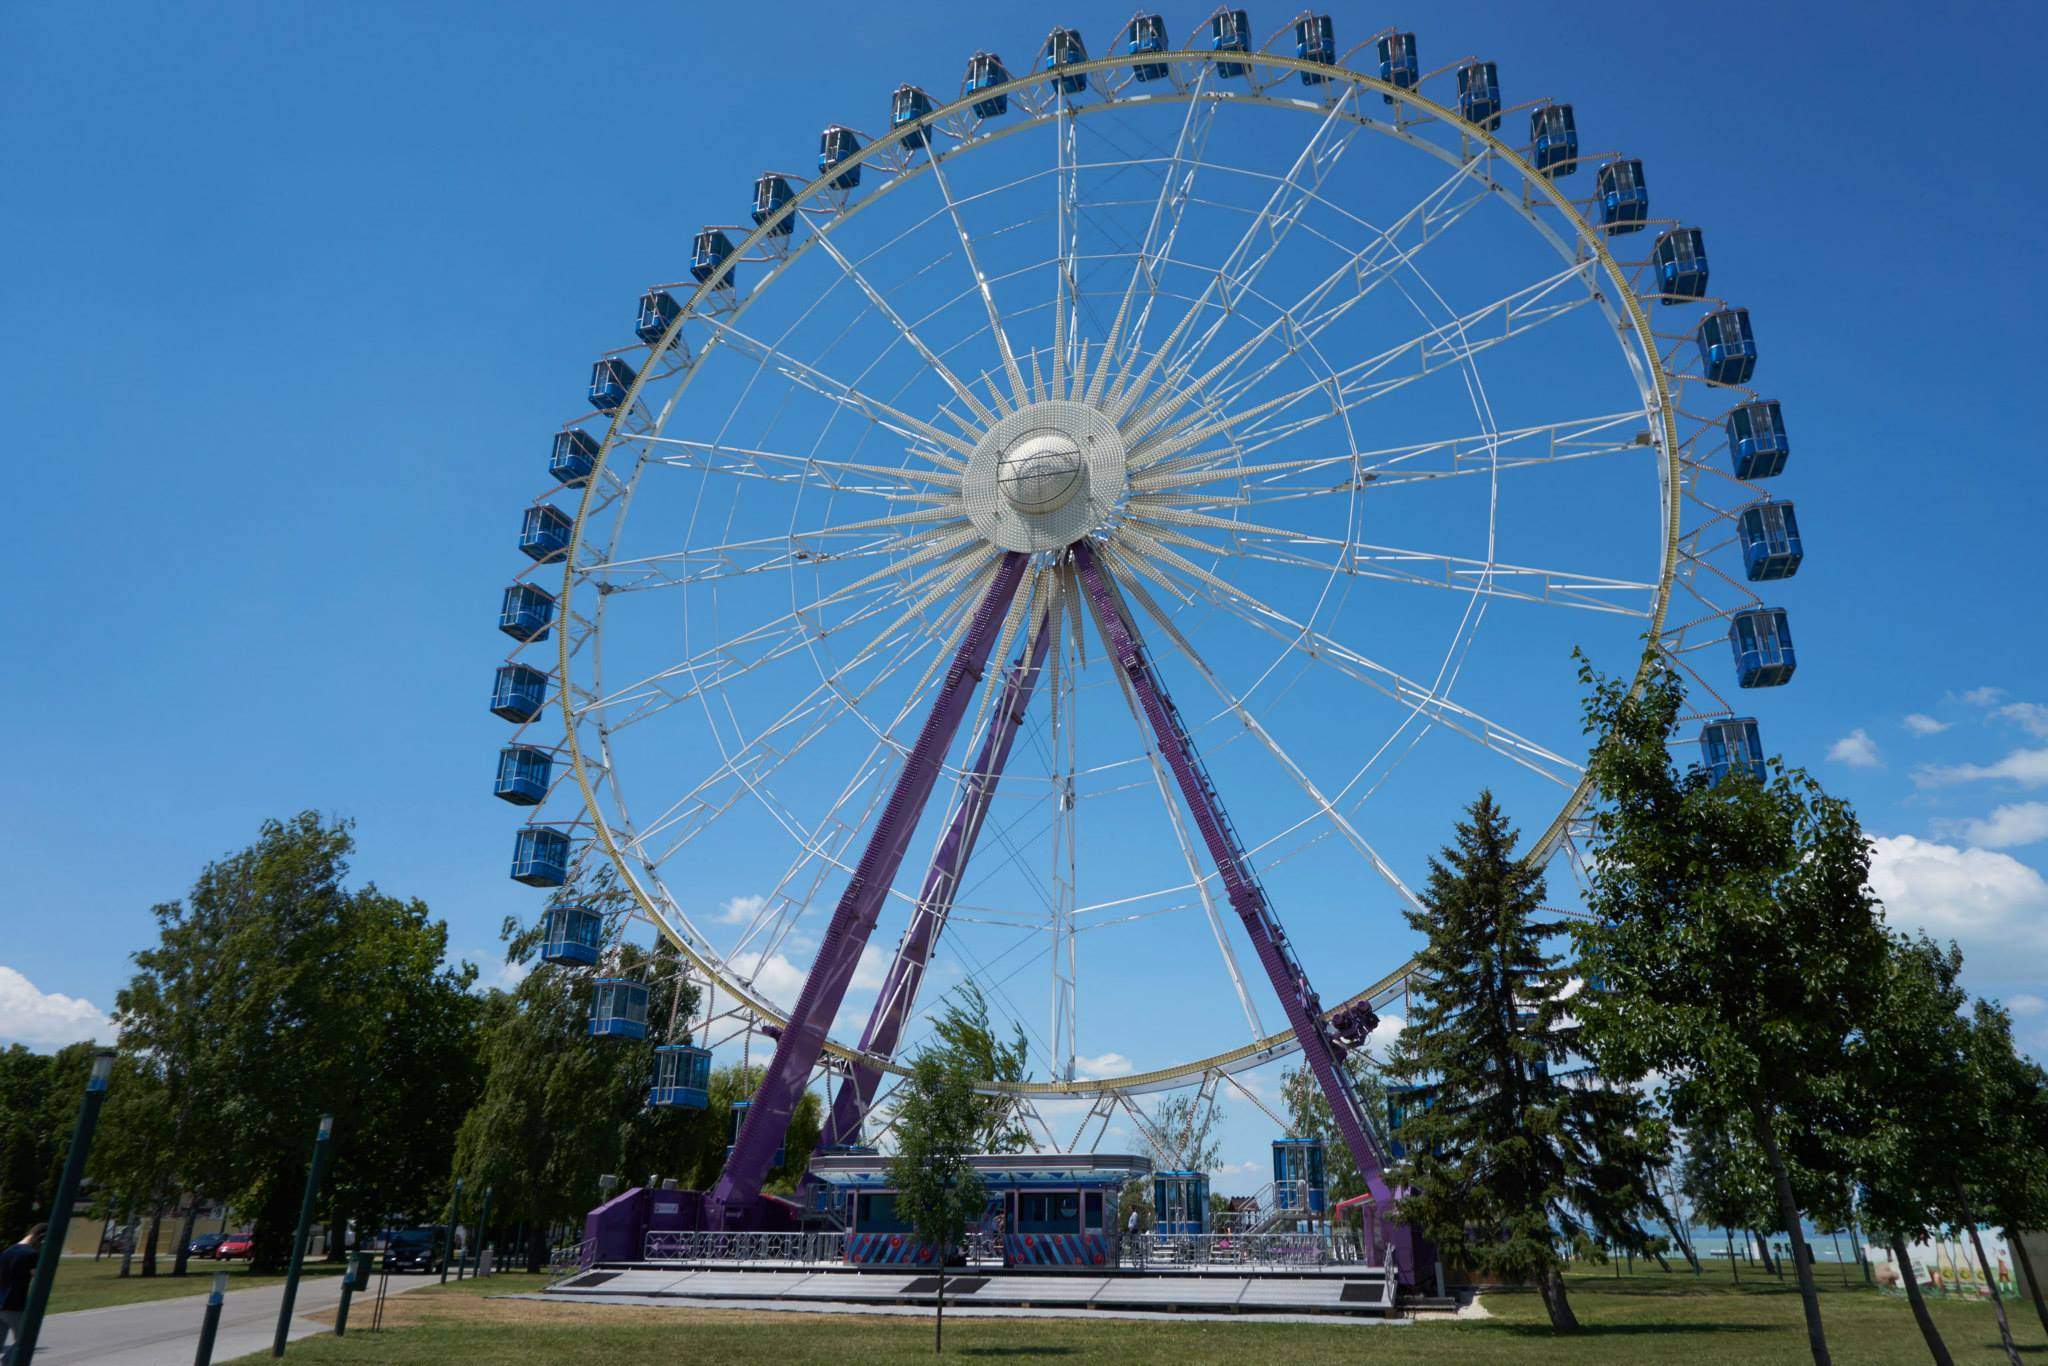 Siófok ferris wheel